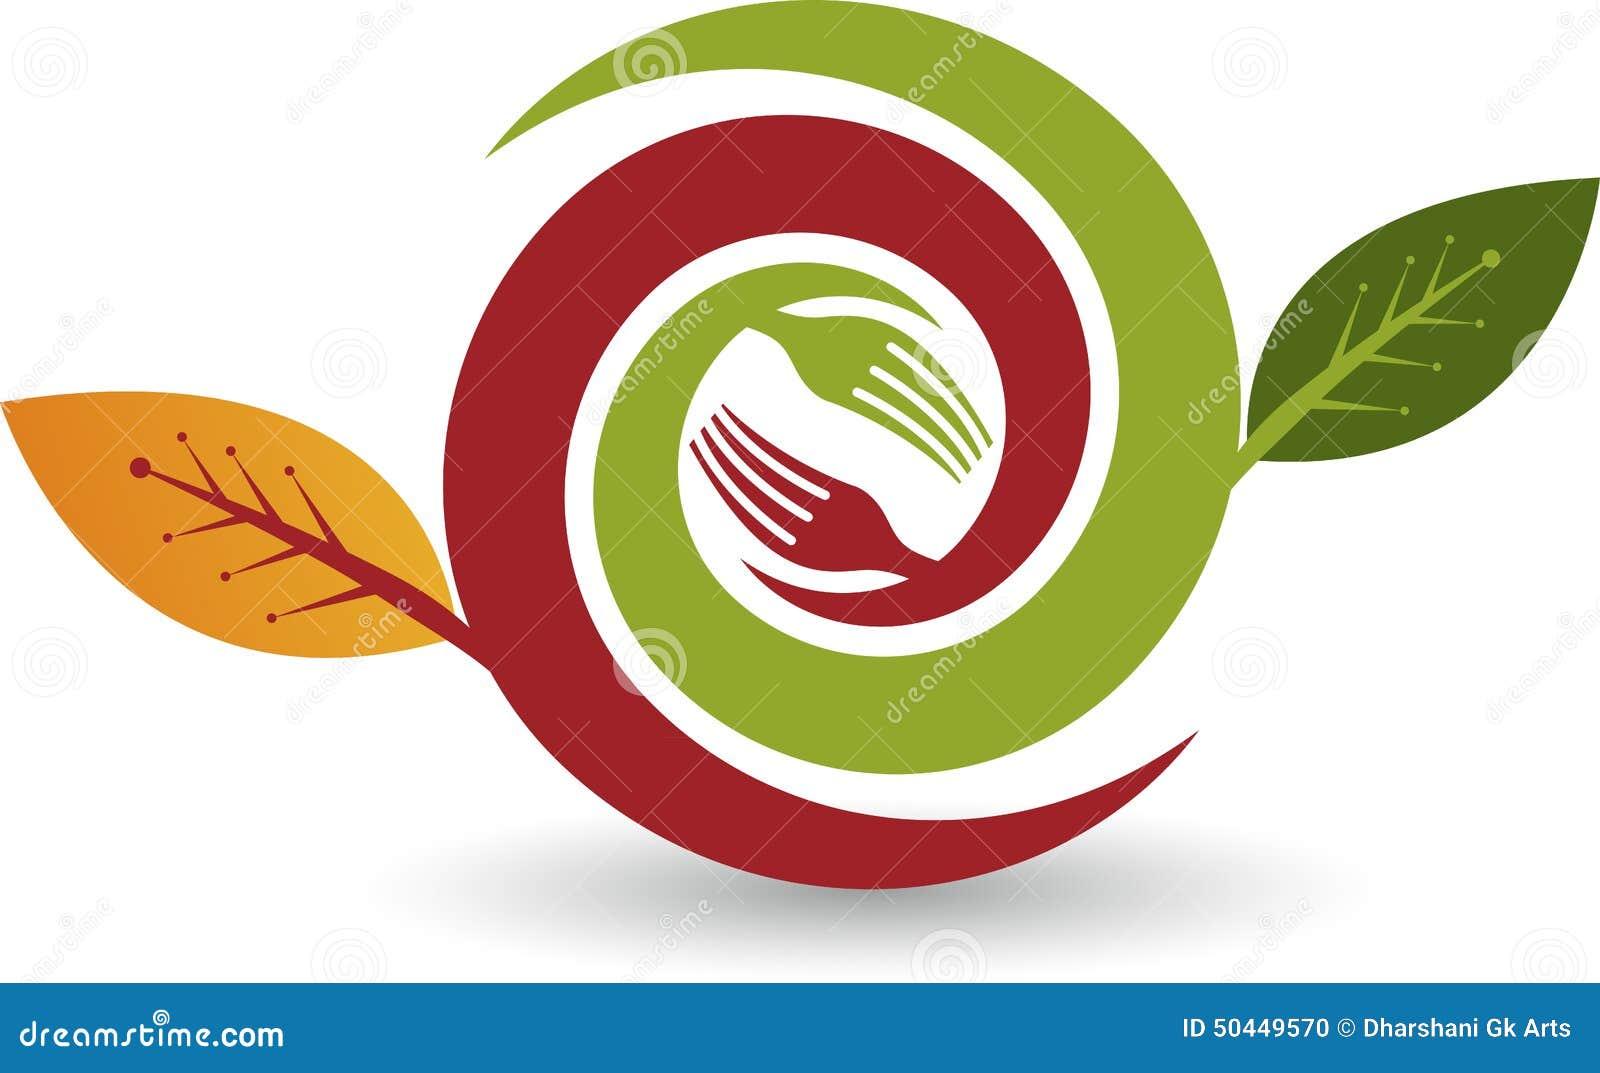 Herbal food logo vector illustration for Cuisine logo